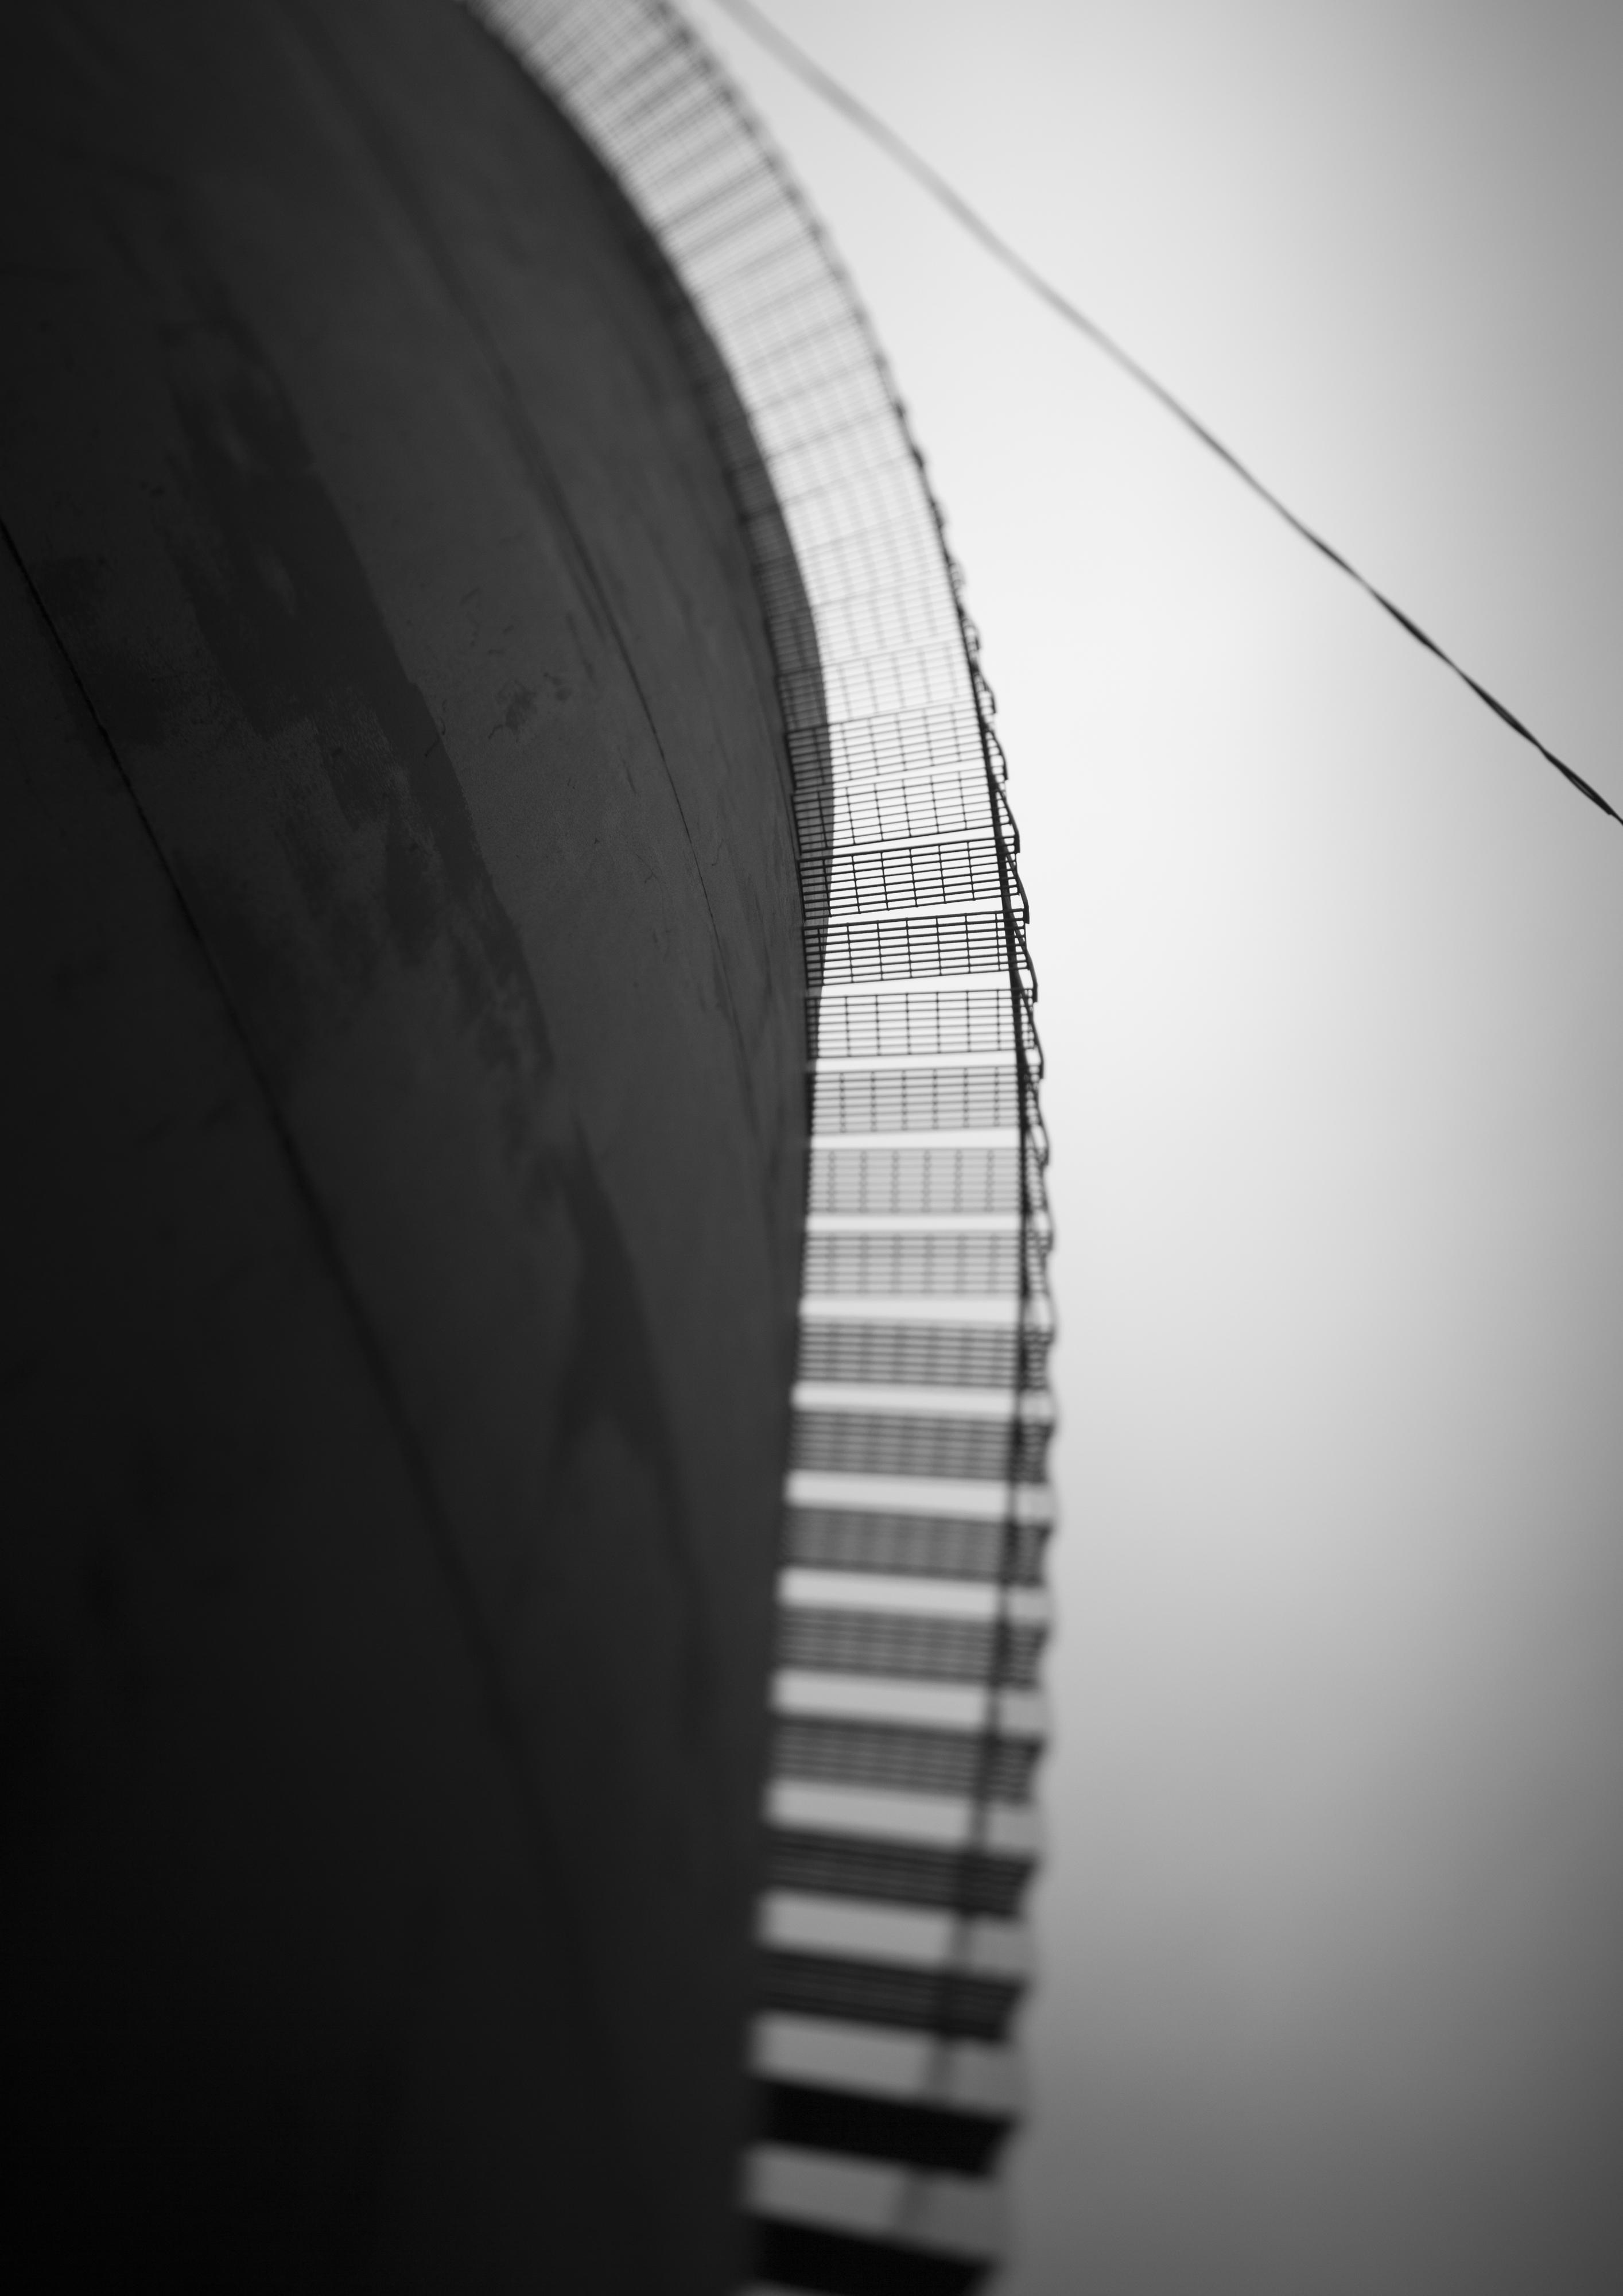 Escaliers 01